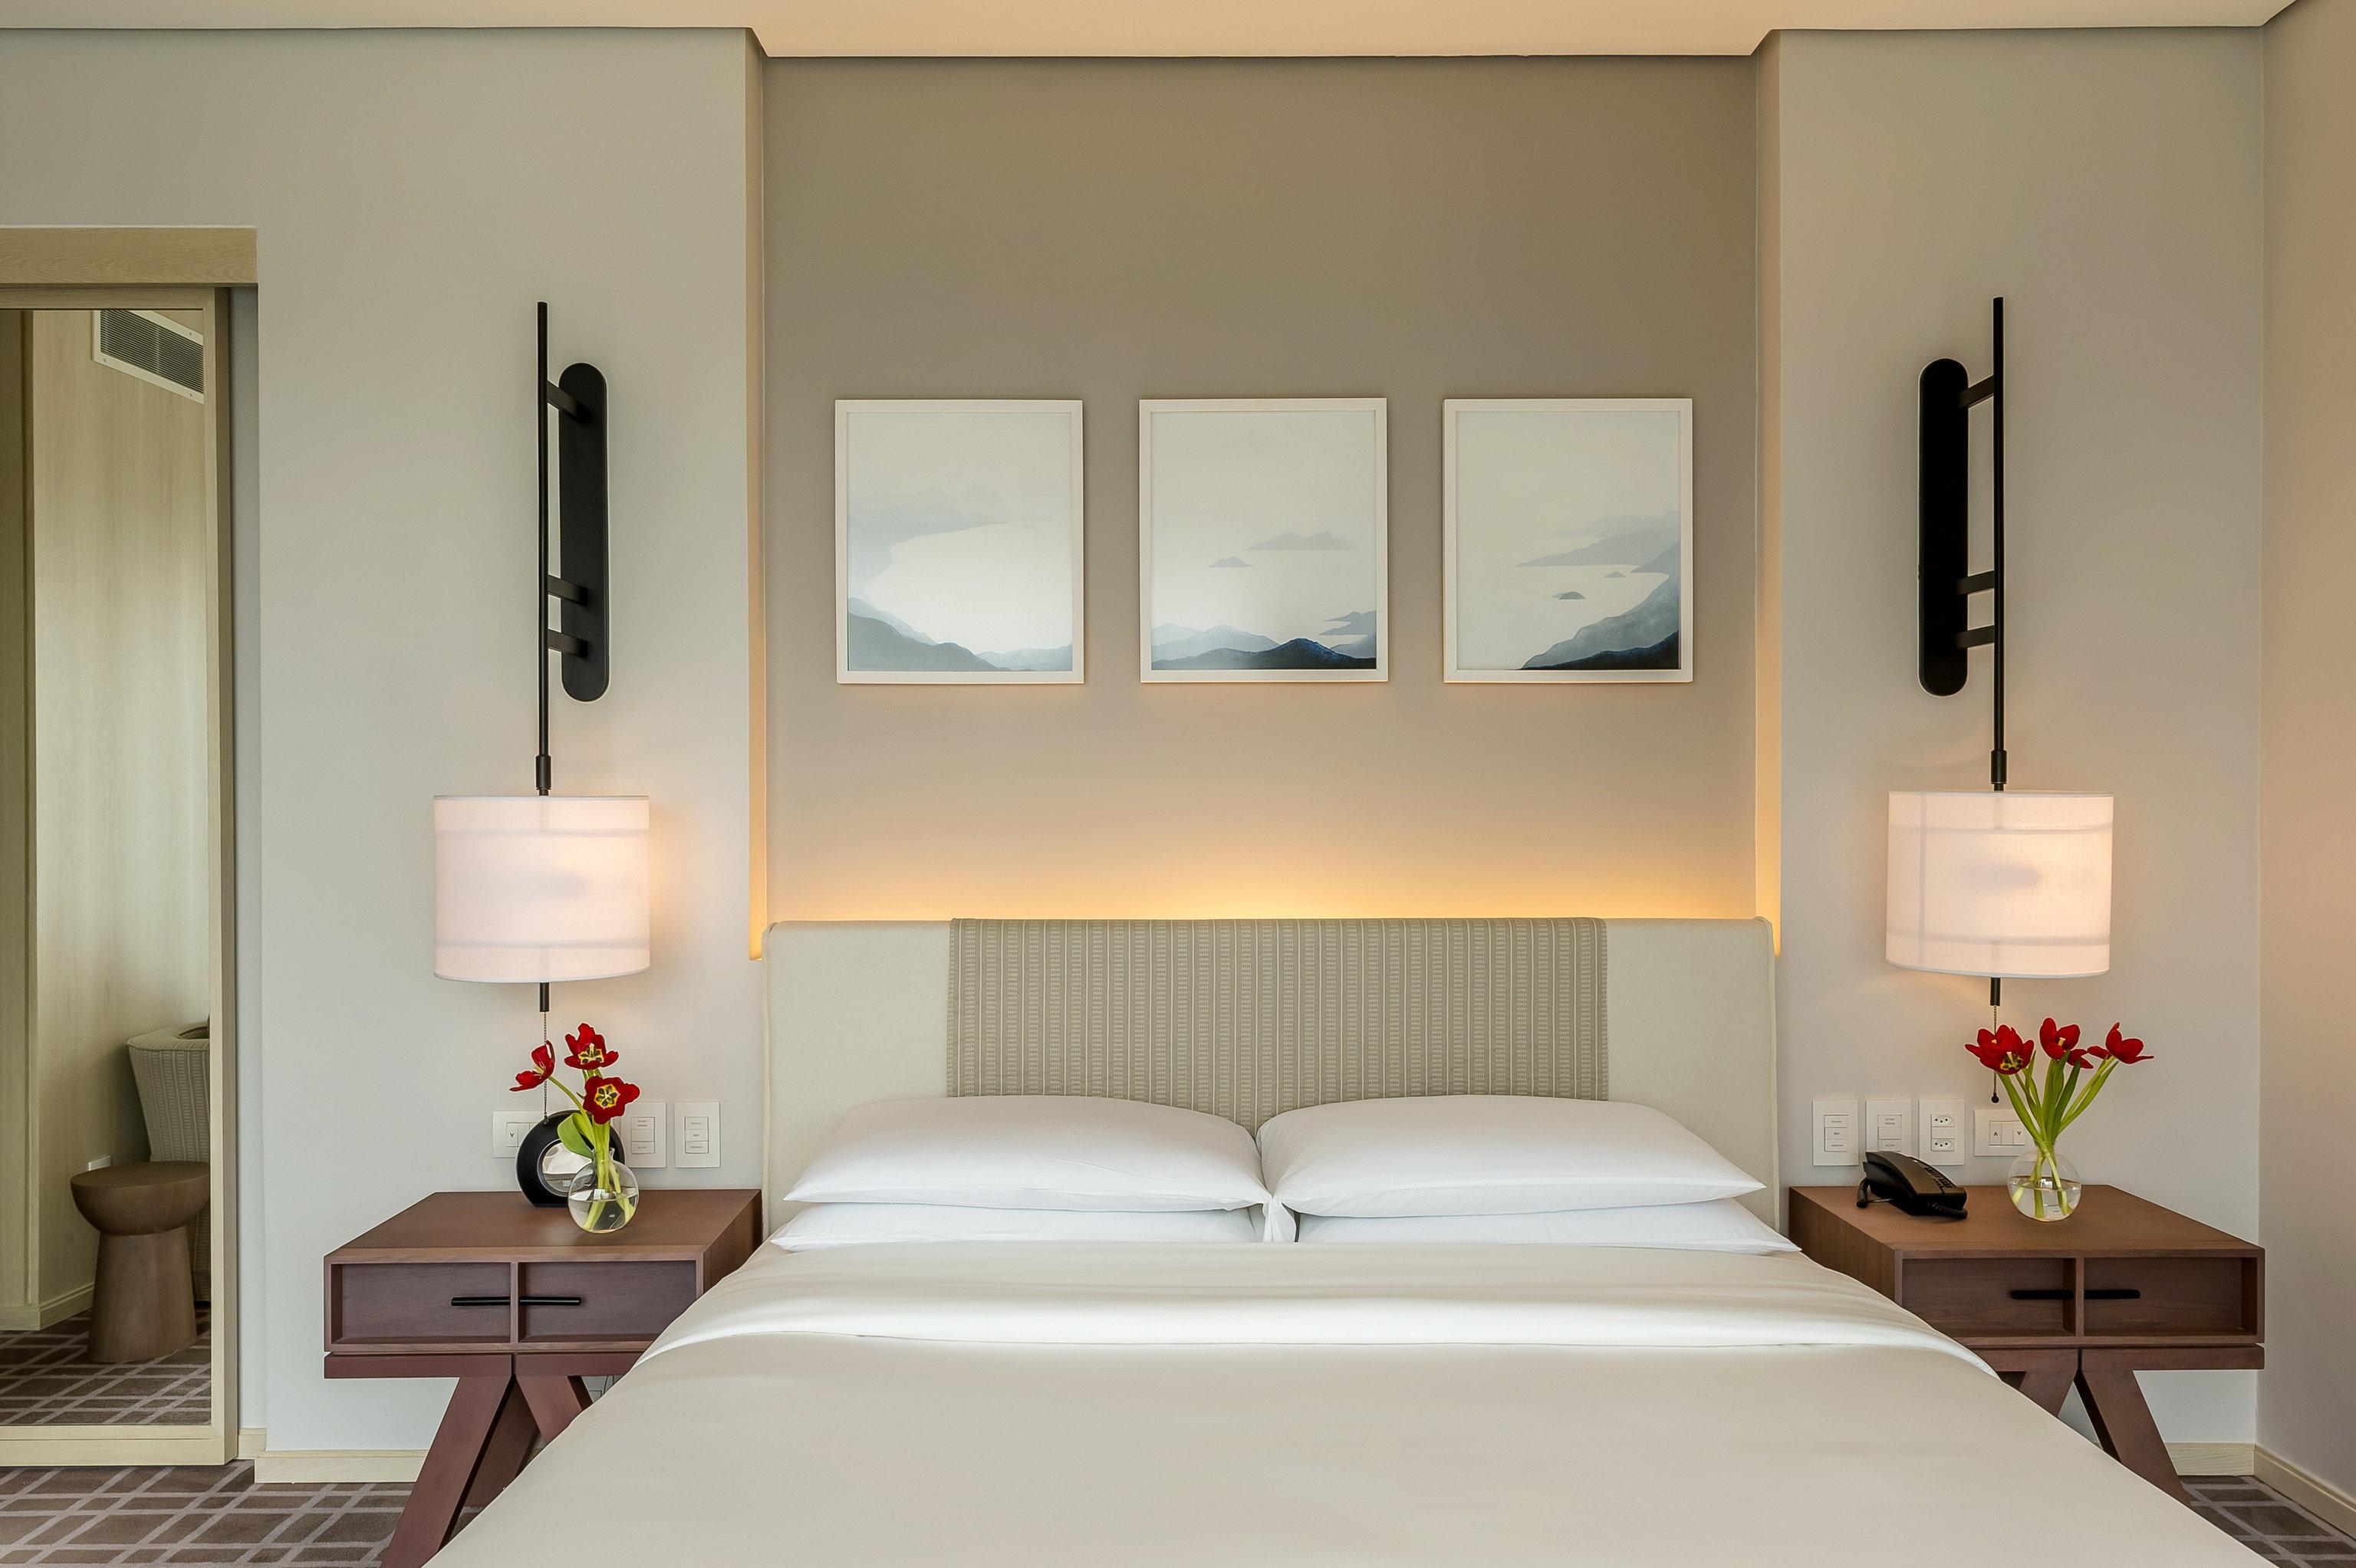 Hotels Romance wall indoor room interior design Suite bed Bedroom home furniture bed frame ceiling window interior designer hotel floor